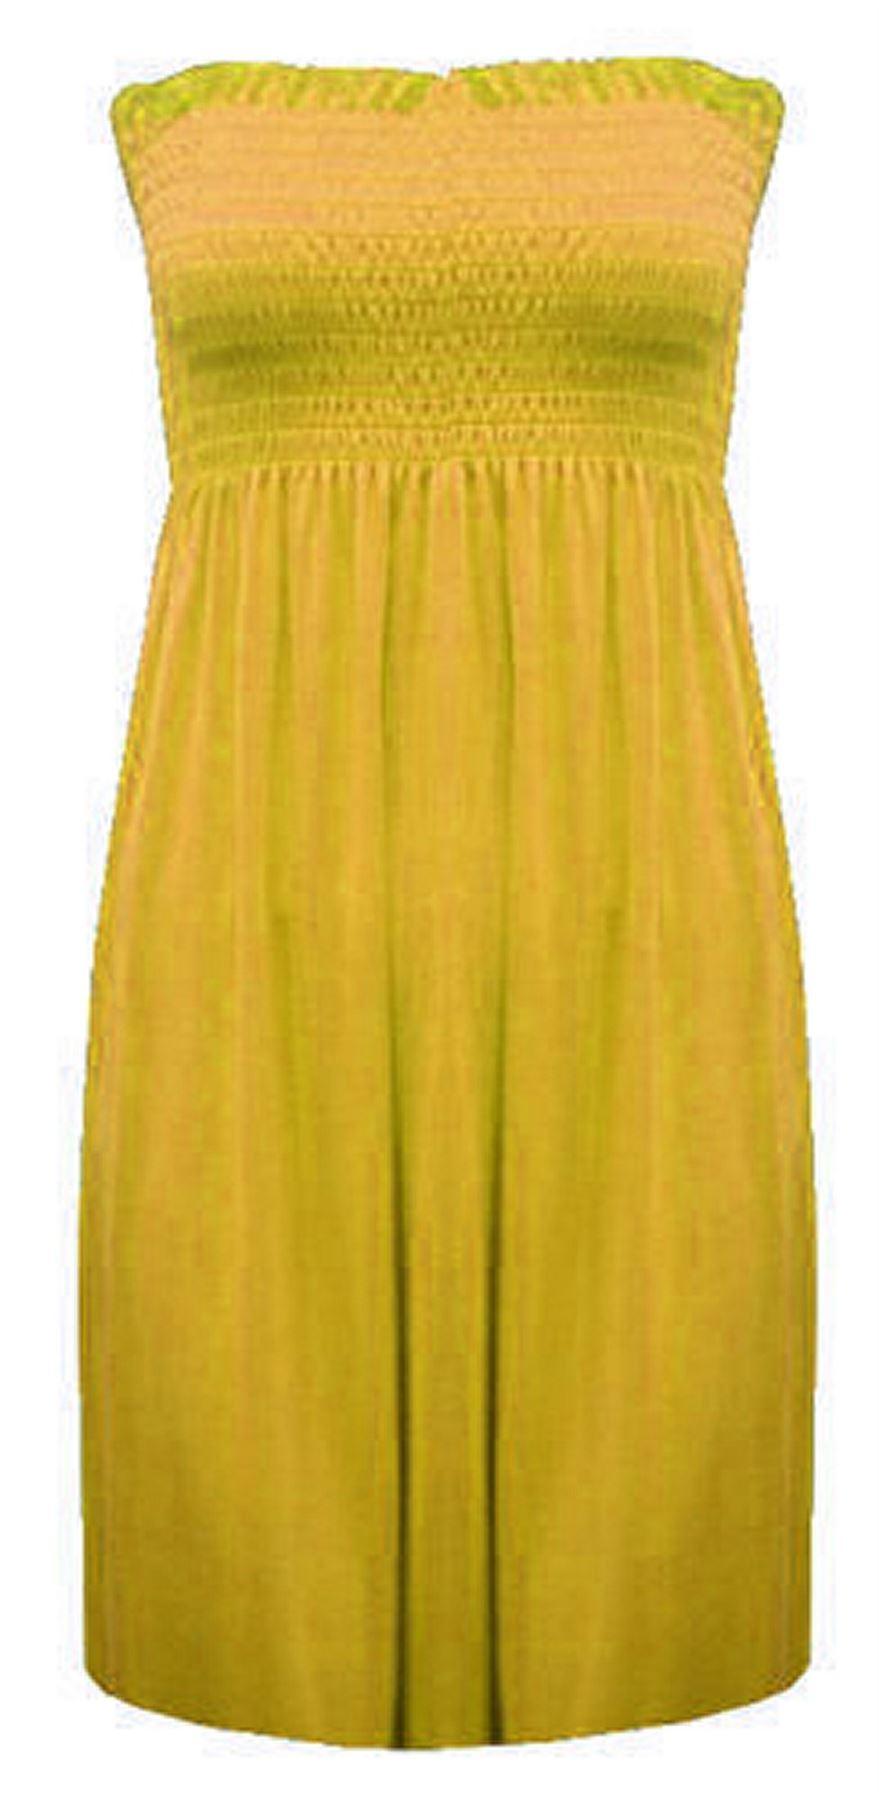 New-Ladies-Bandeau-Boob-Gathering-Tops-Boob-Tube-Beach-Wear-Tunics-8-26 thumbnail 92